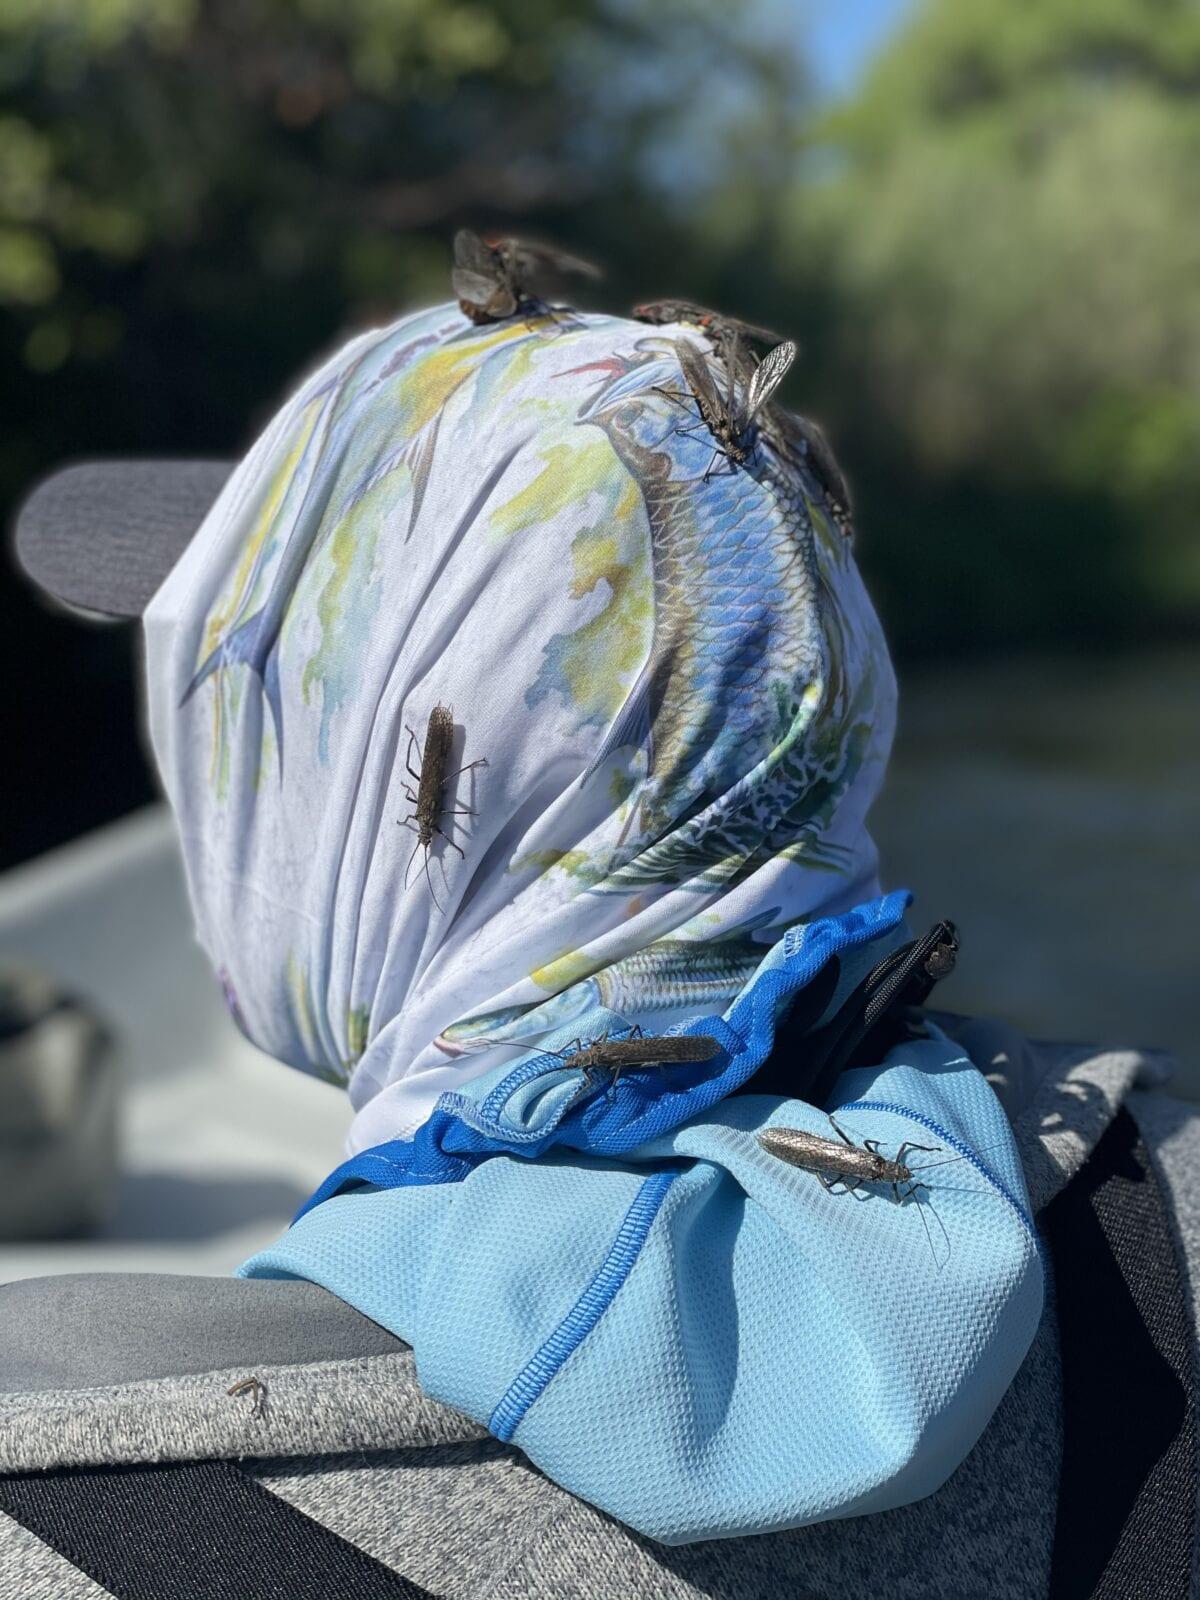 Salmon Fly season